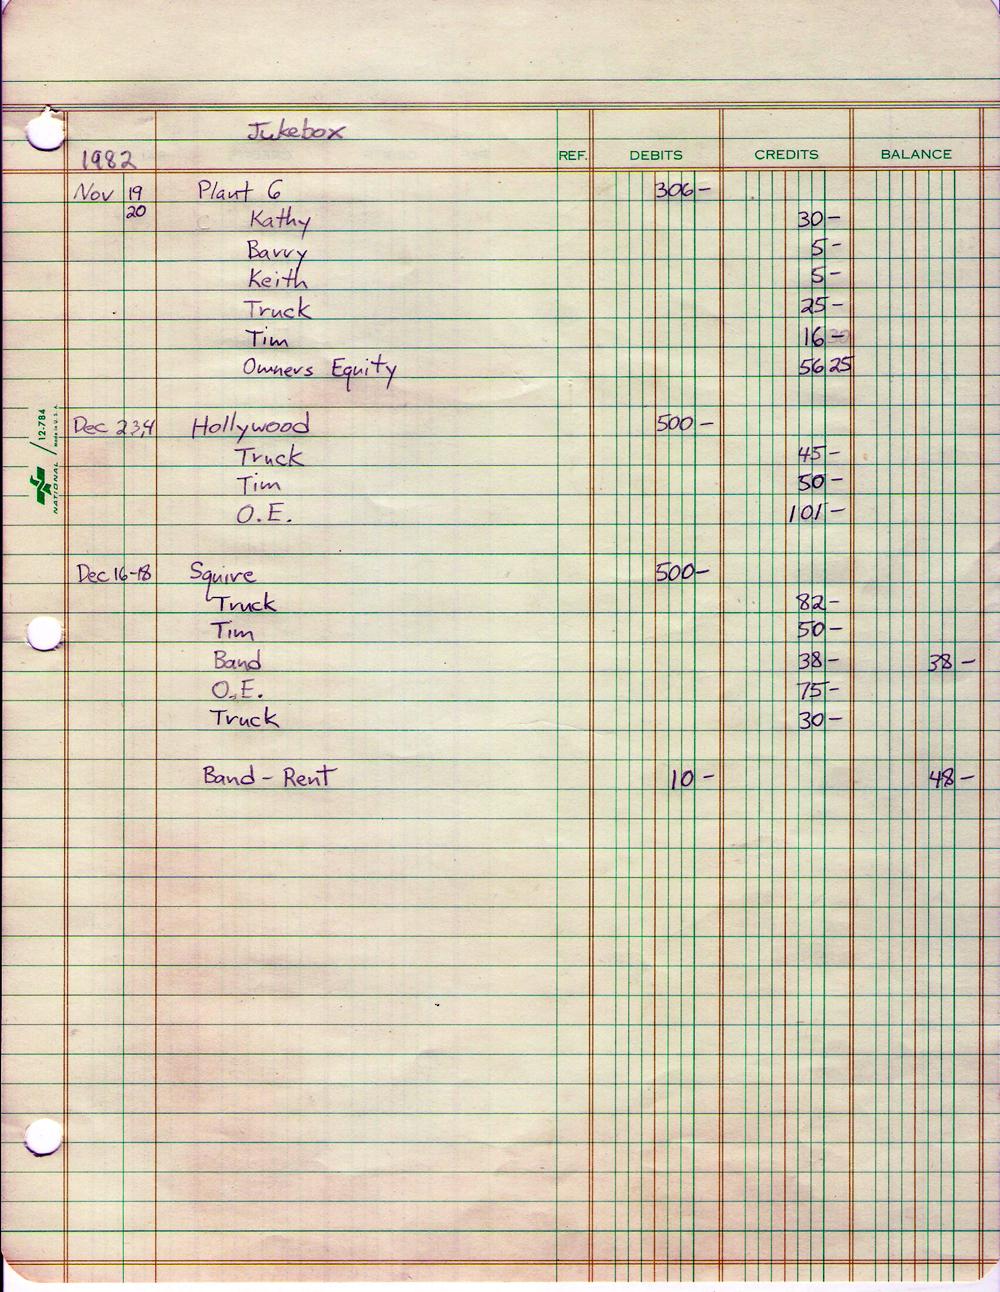 November - December 1982